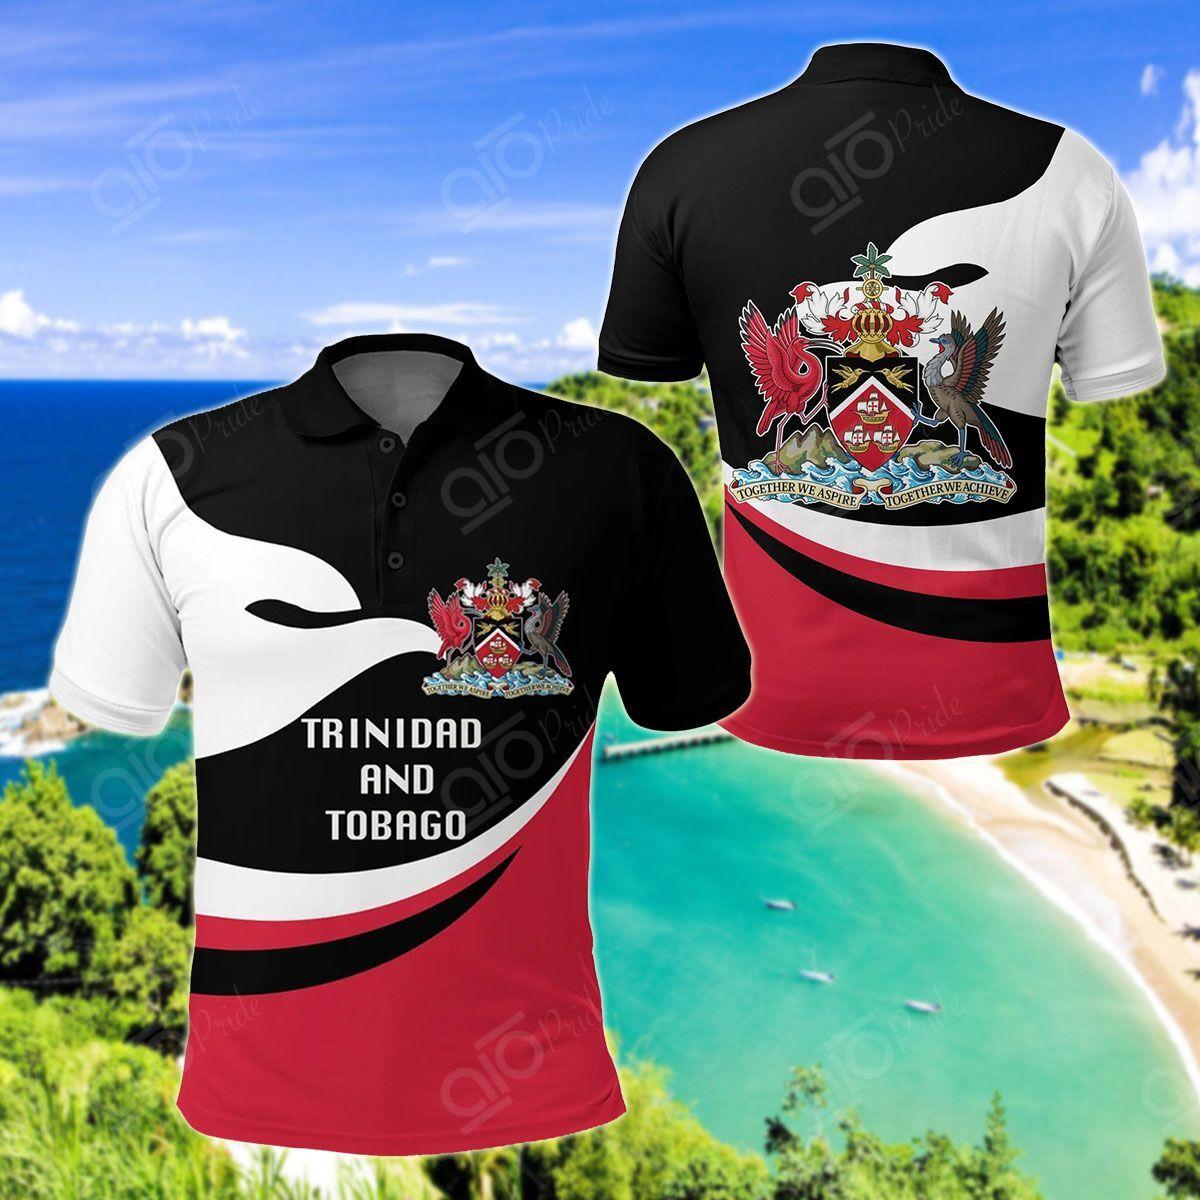 NS Trinidad And Tobago Proud Version All Over Print Polo Shirt